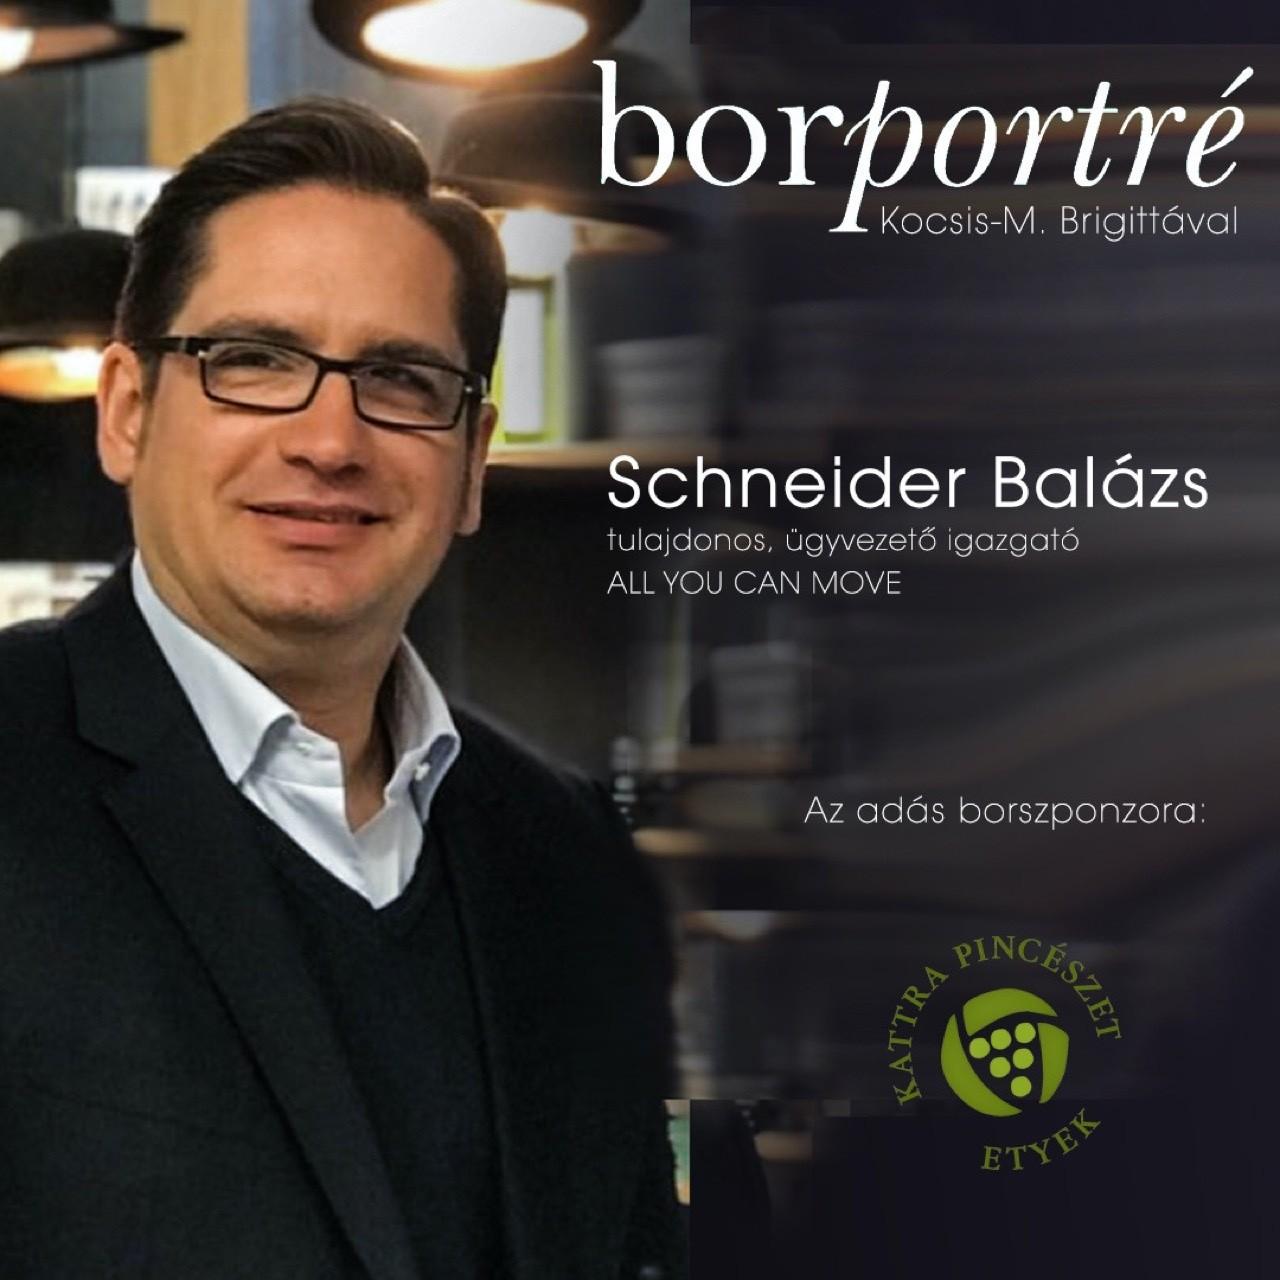 borportre_2021_03_17_schneider_balazs_AYCM_Kattra_kocka